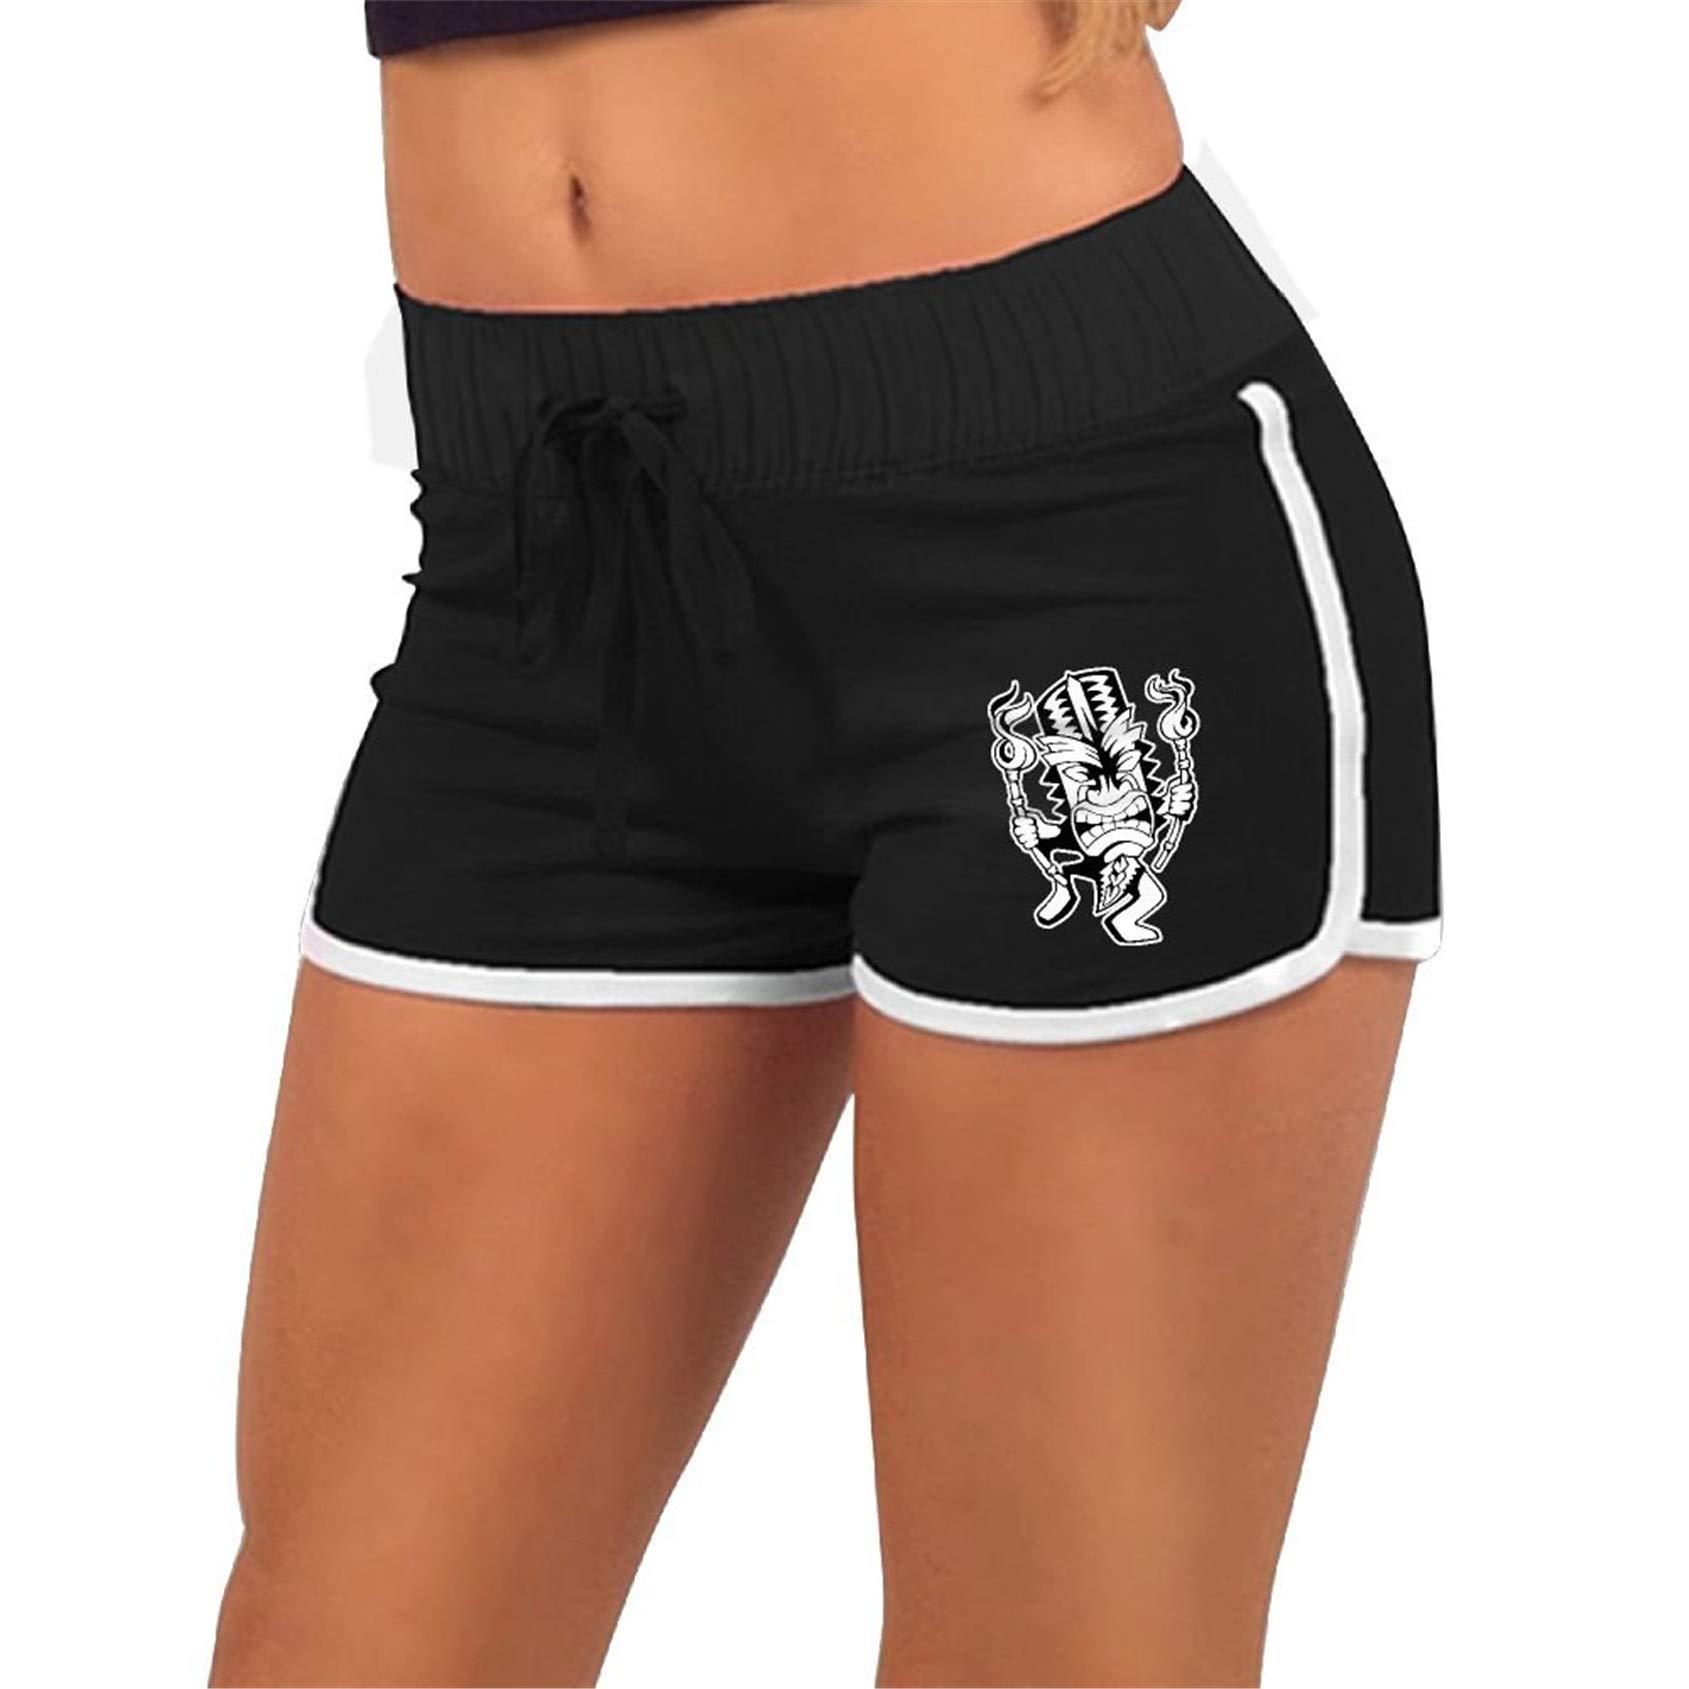 Dancing Hawaiian Tiki,Running,Workout Shorts Pants with,Athletic Elastic Waist Womens Sports Shorts